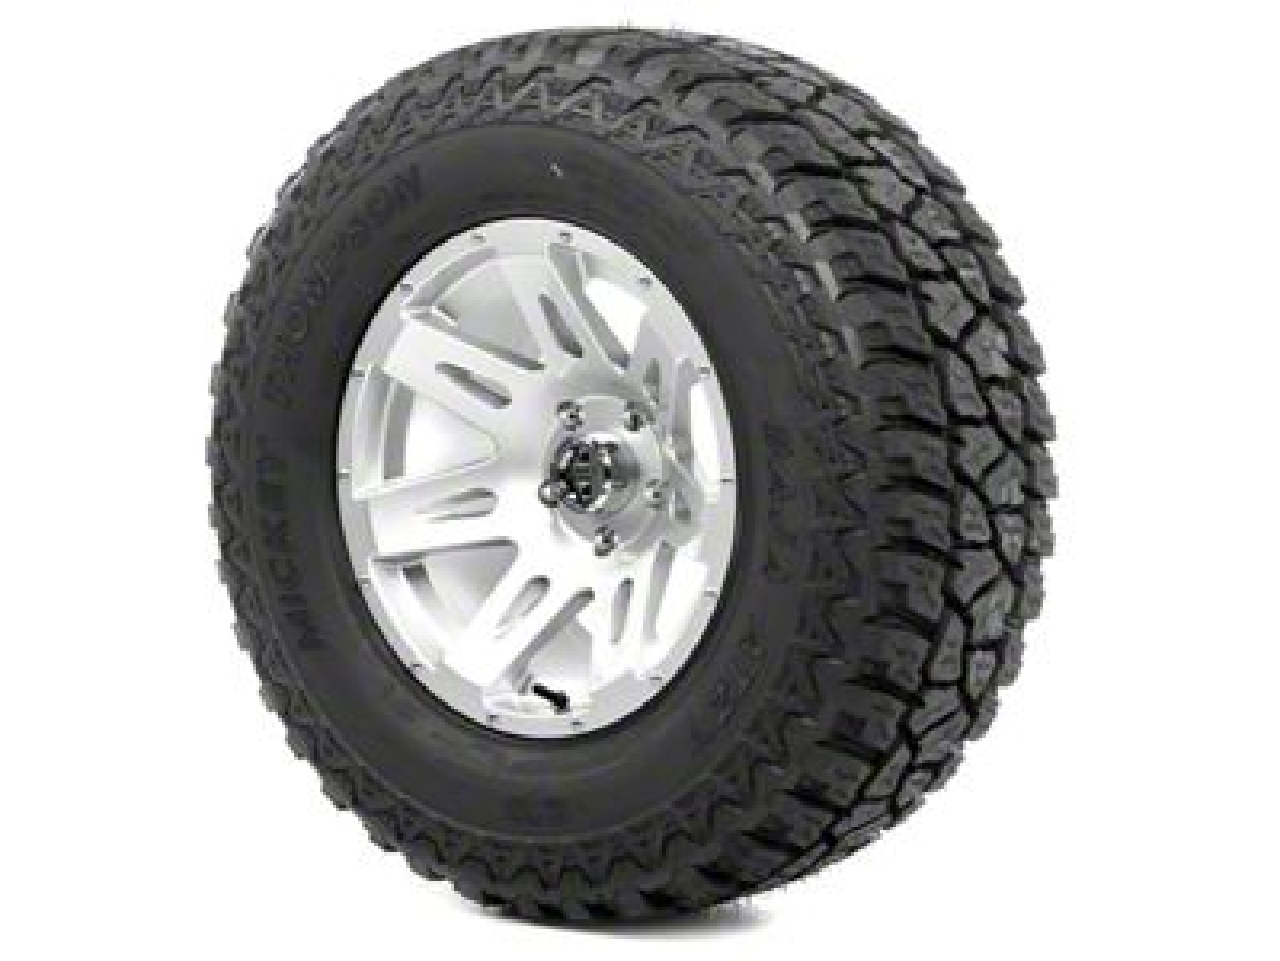 Rugged Ridge XHD Wheel 17x9 Silver and Mickey Thompson ATZ P3 315/70R17 Tire Kit (07-18 Jeep Wrangler JK)